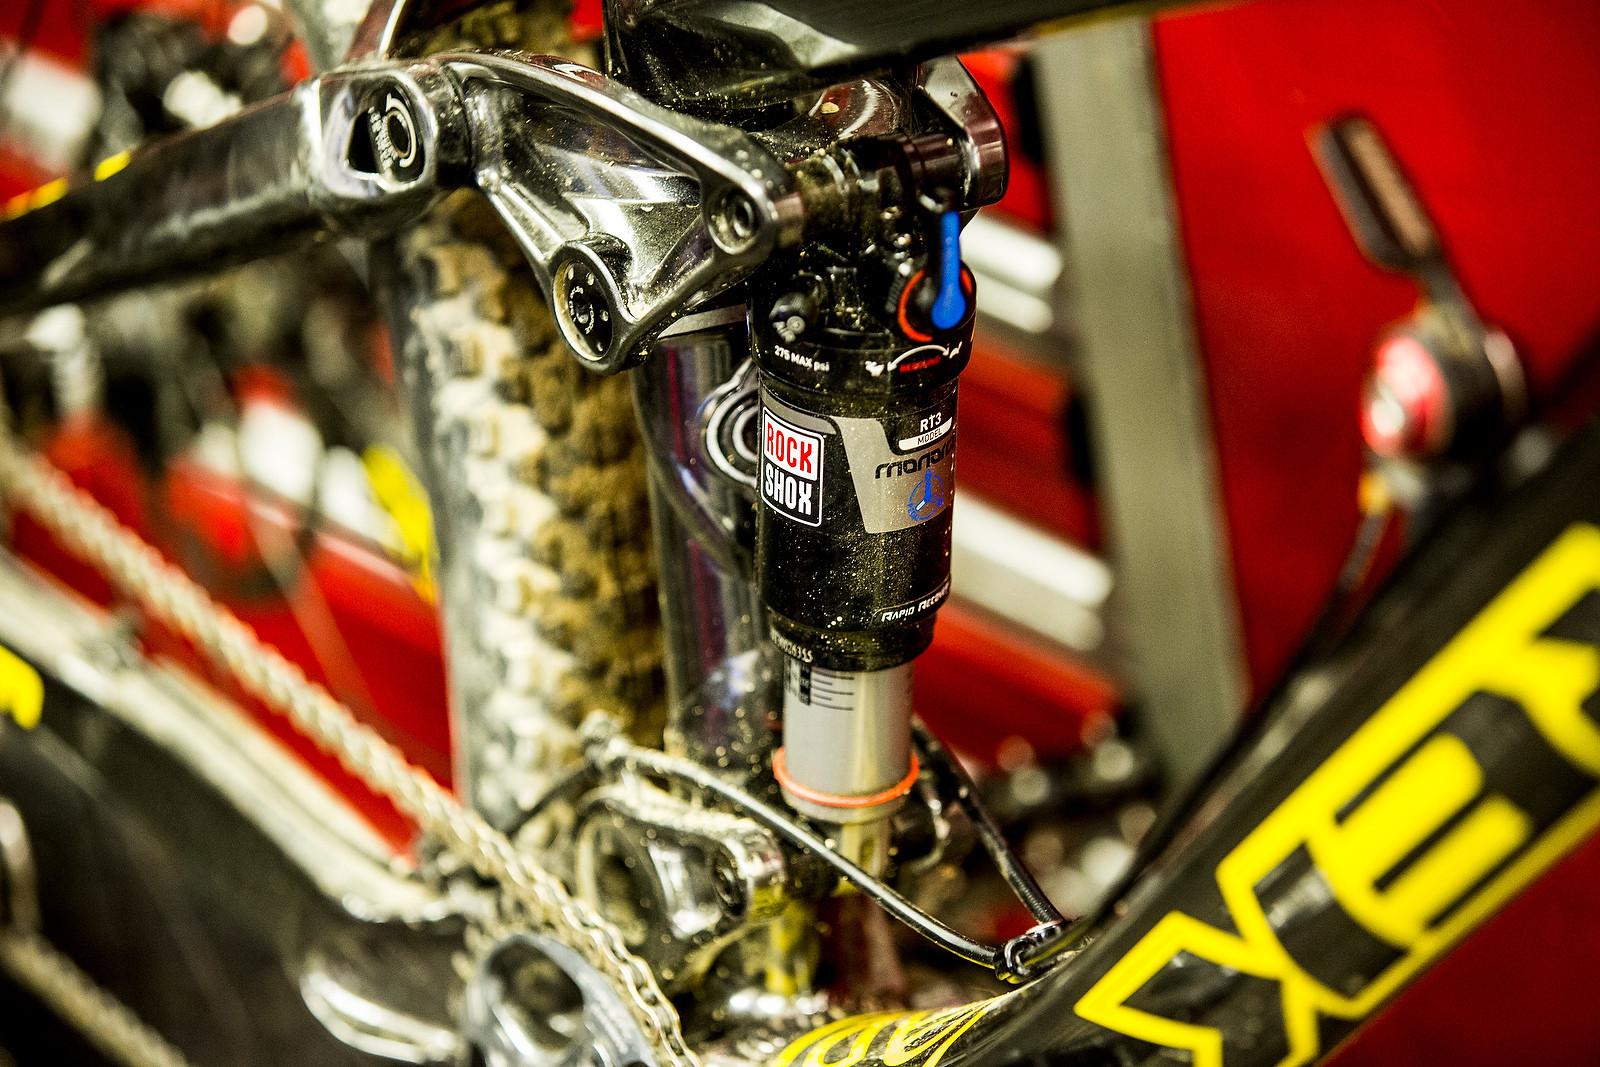 Brandon Semenuk's Winning Bike - Winning Bike: Brandon Semenuk's Trek Ticket S - Mountain Biking Pictures - Vital MTB